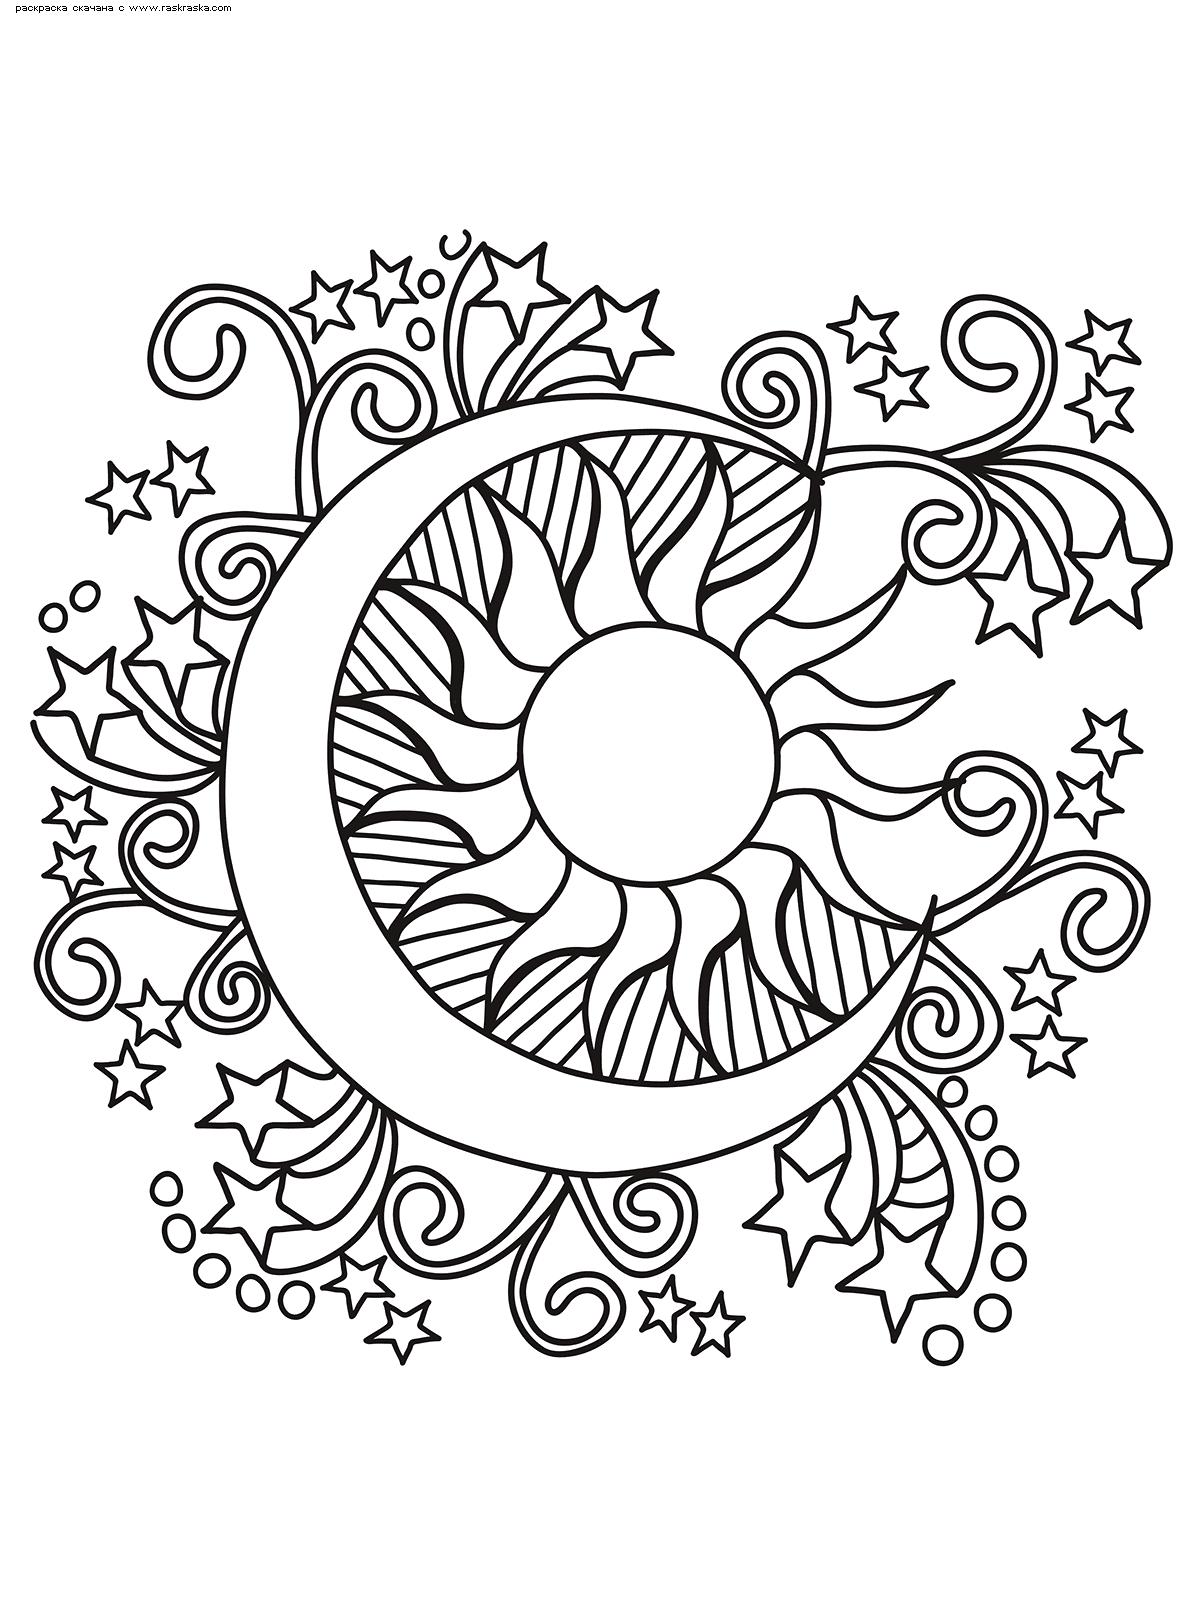 Раскраска Полумесяц и Солнце. Раскраска антистресс, луна, солнце